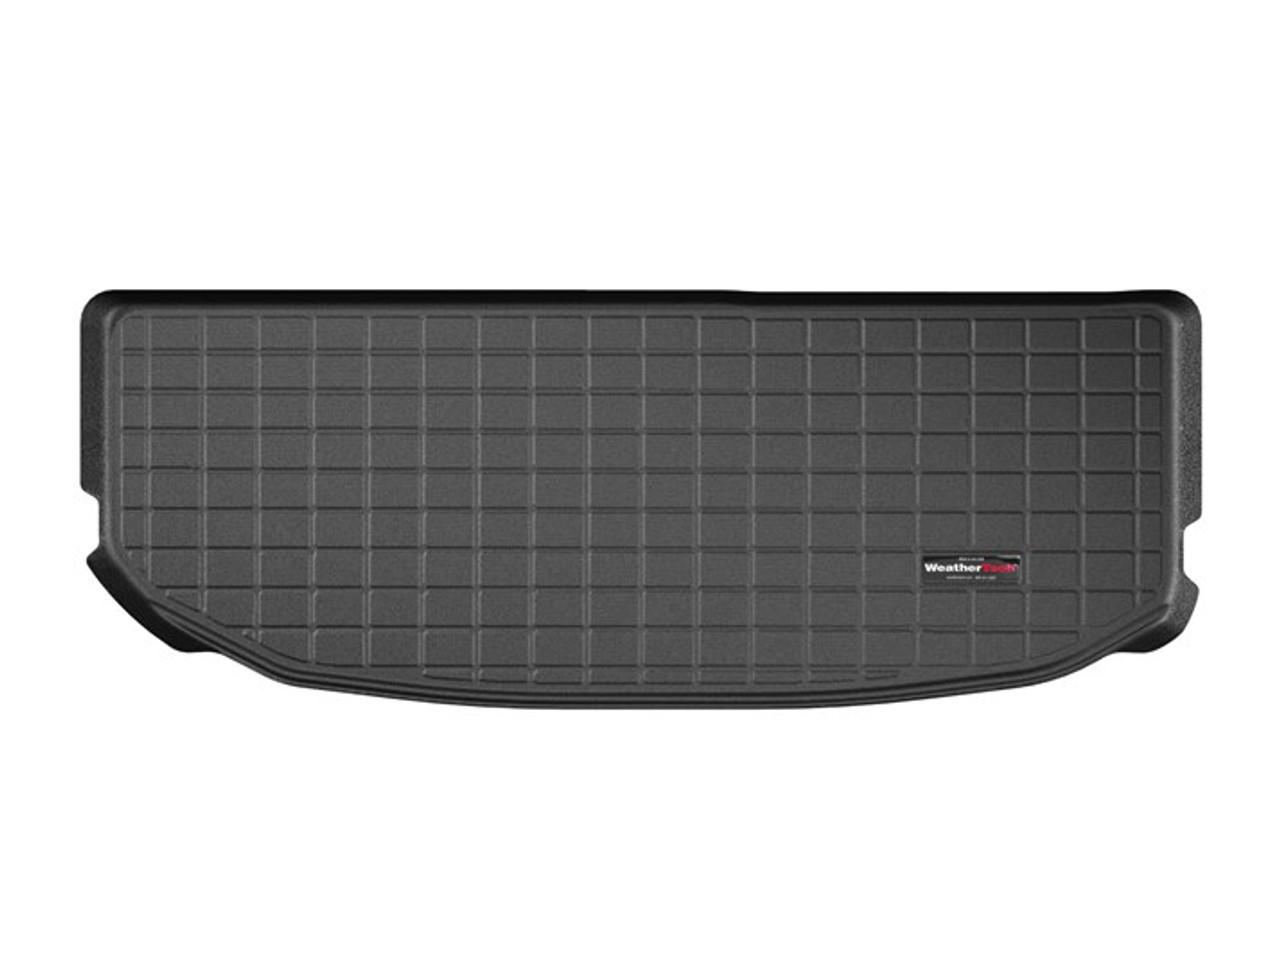 2020-2021 Hyundai Palisade WeatherTech Cargo Liner - Behind 3rd Row (Black)